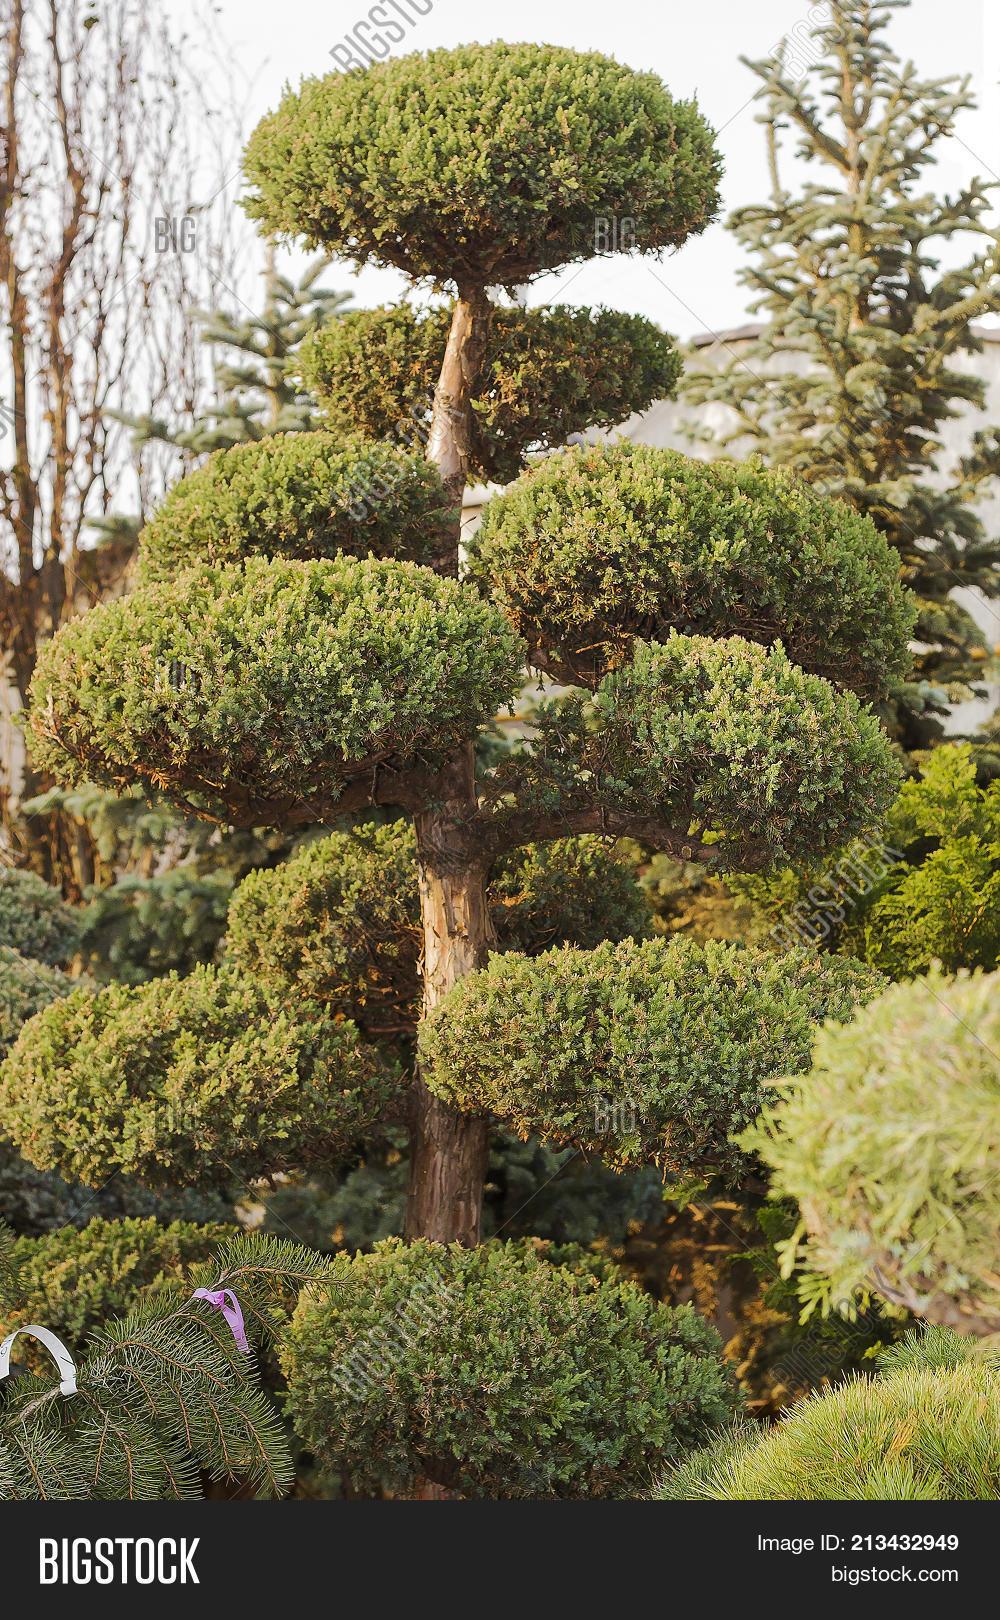 High Taxus Evergreen Image & Photo (Free Trial) | Bigstock